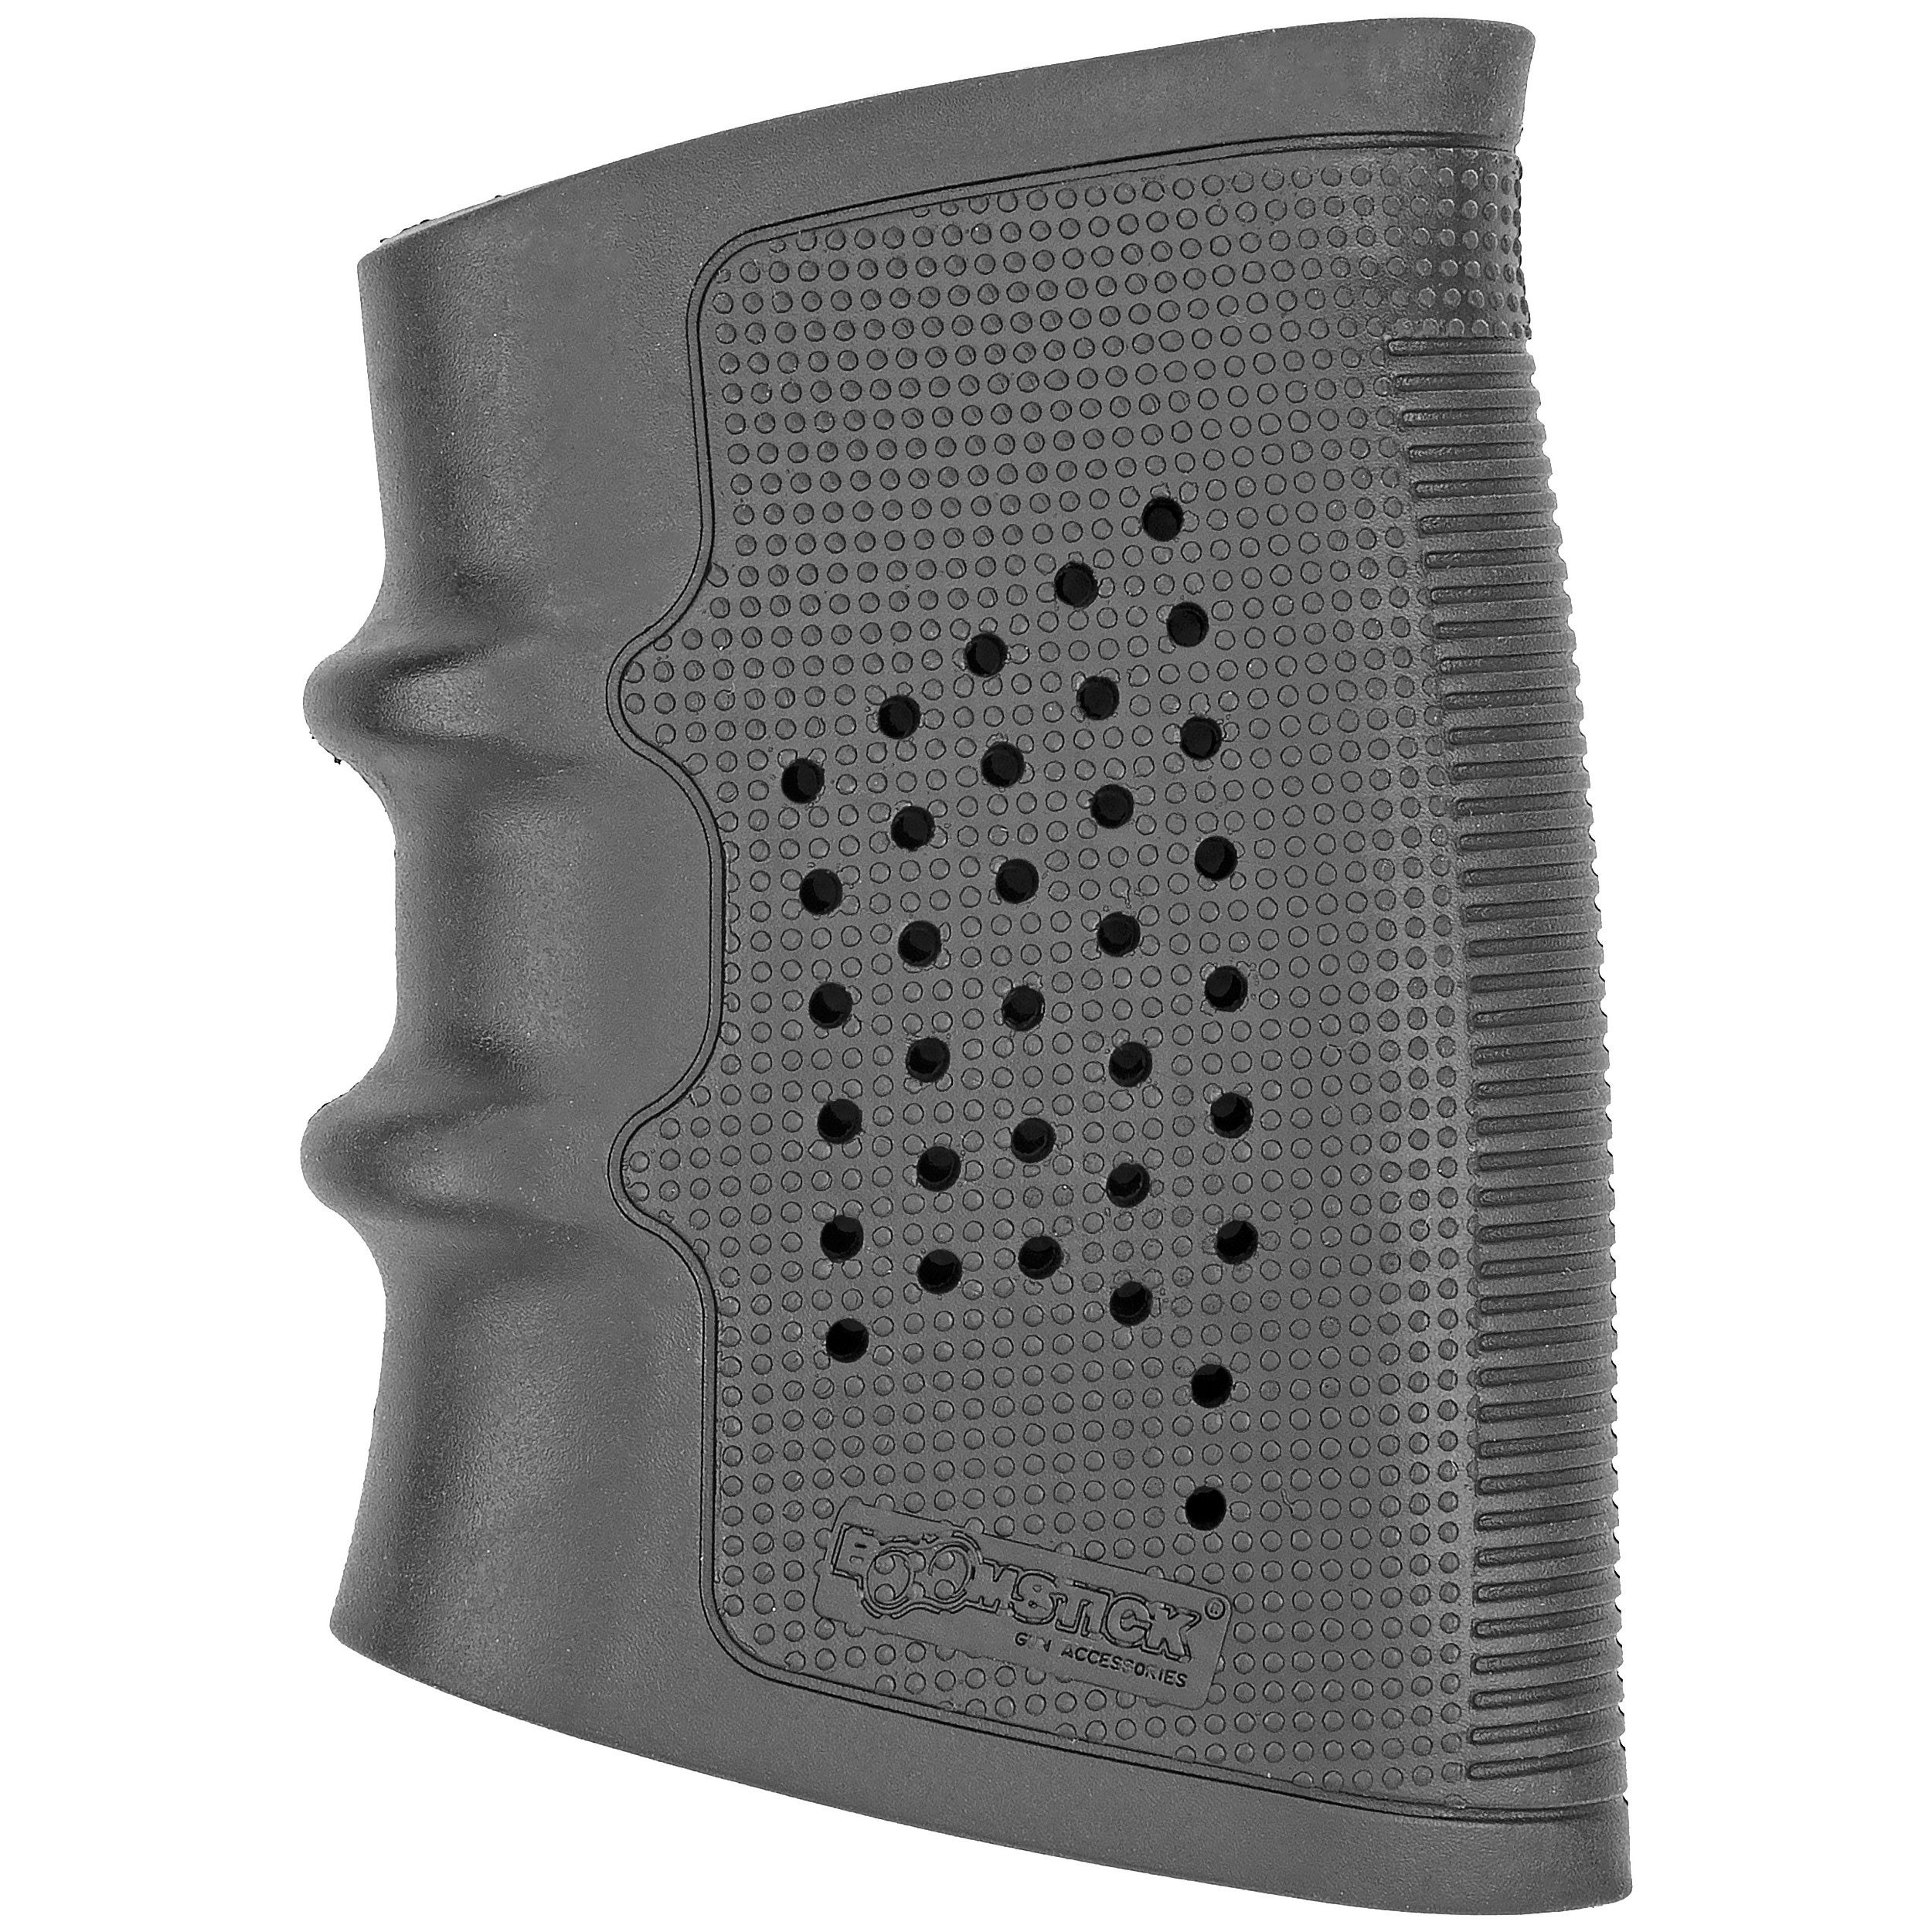 Grip Glove Fits: Ruger SR9, SR40, Full Size Handguns